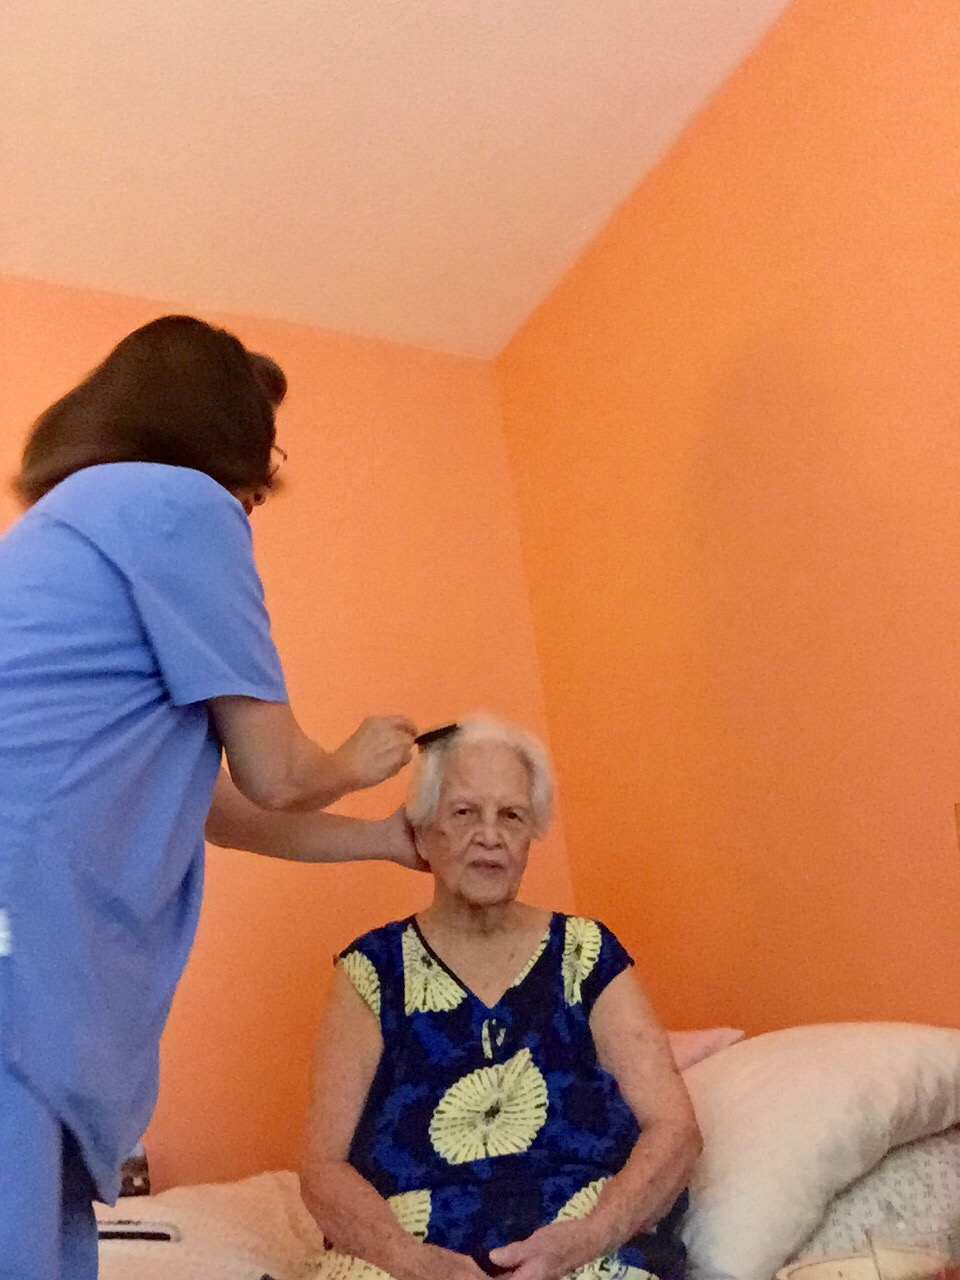 caregiver-brushing-senior-womans-hair